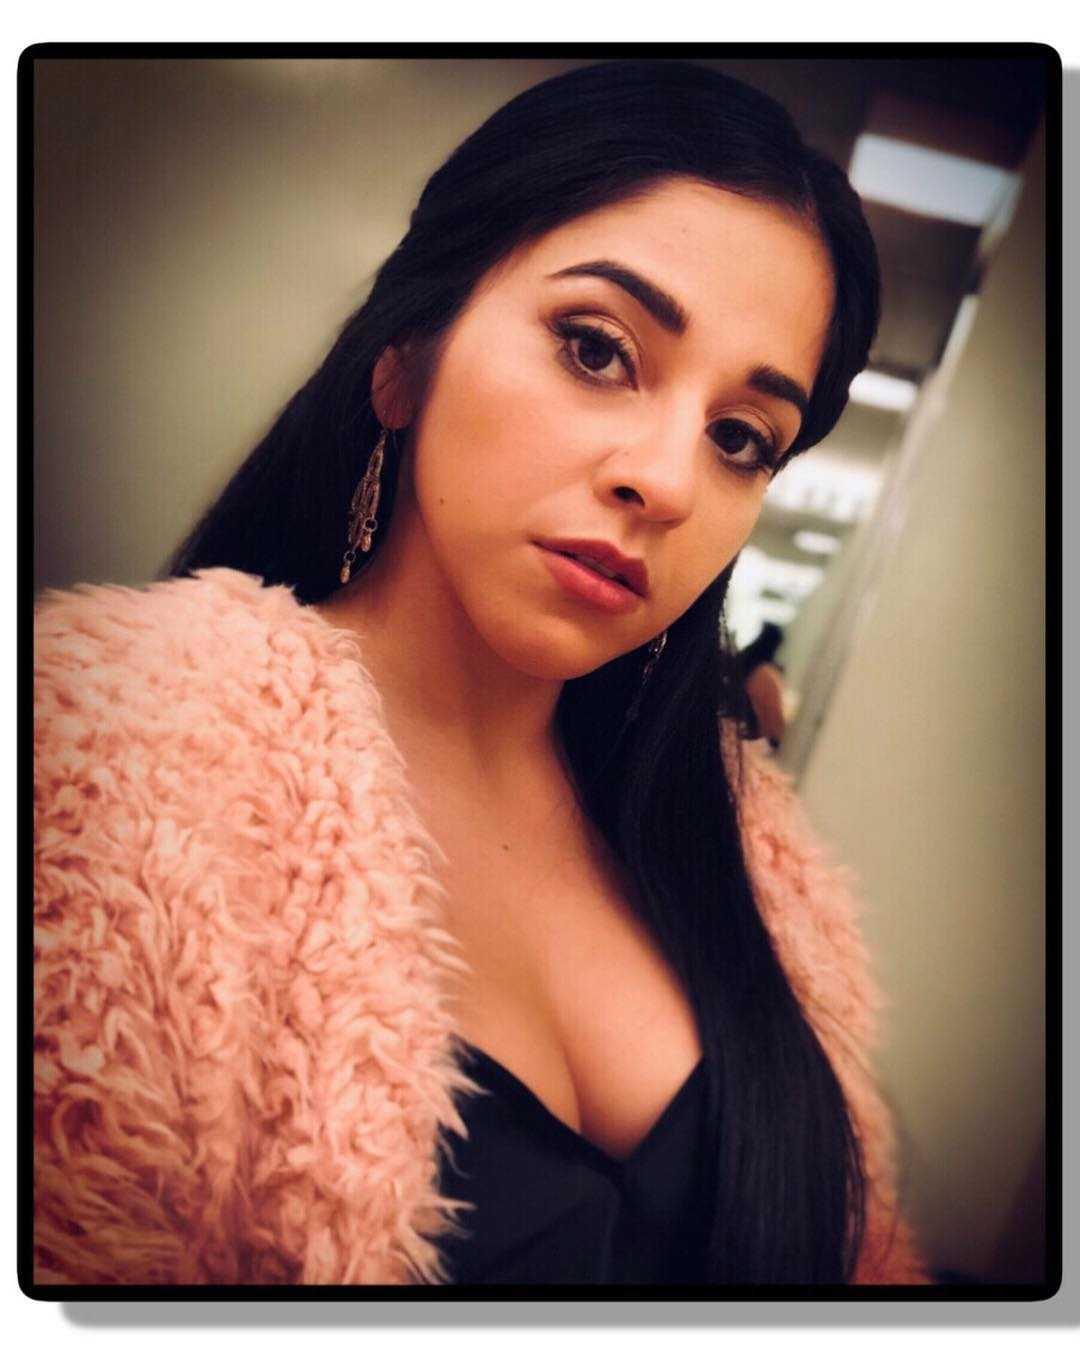 Y&R star Noemi Gonzalez